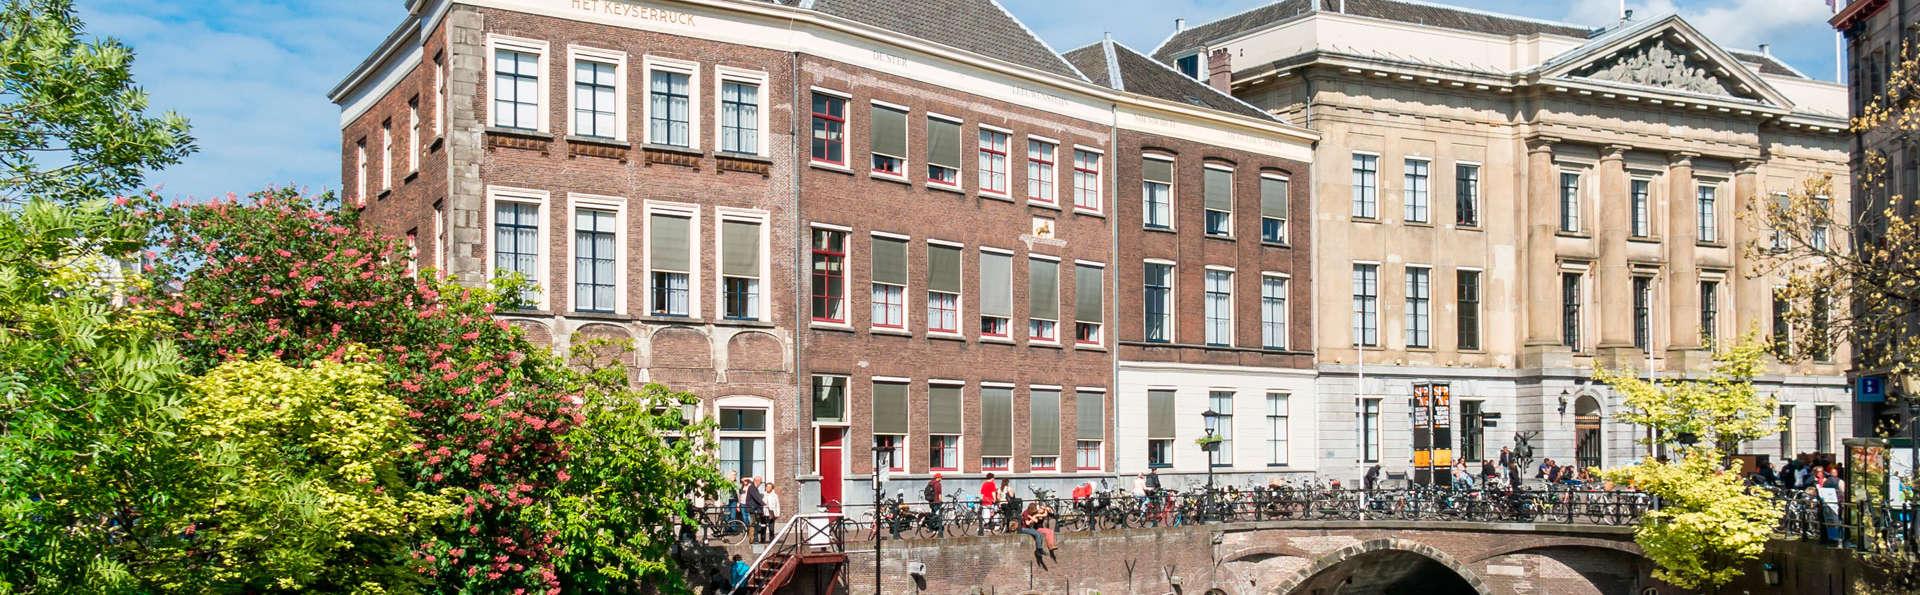 Hotel 't Paviljoen - EDIT_utrecht.jpg